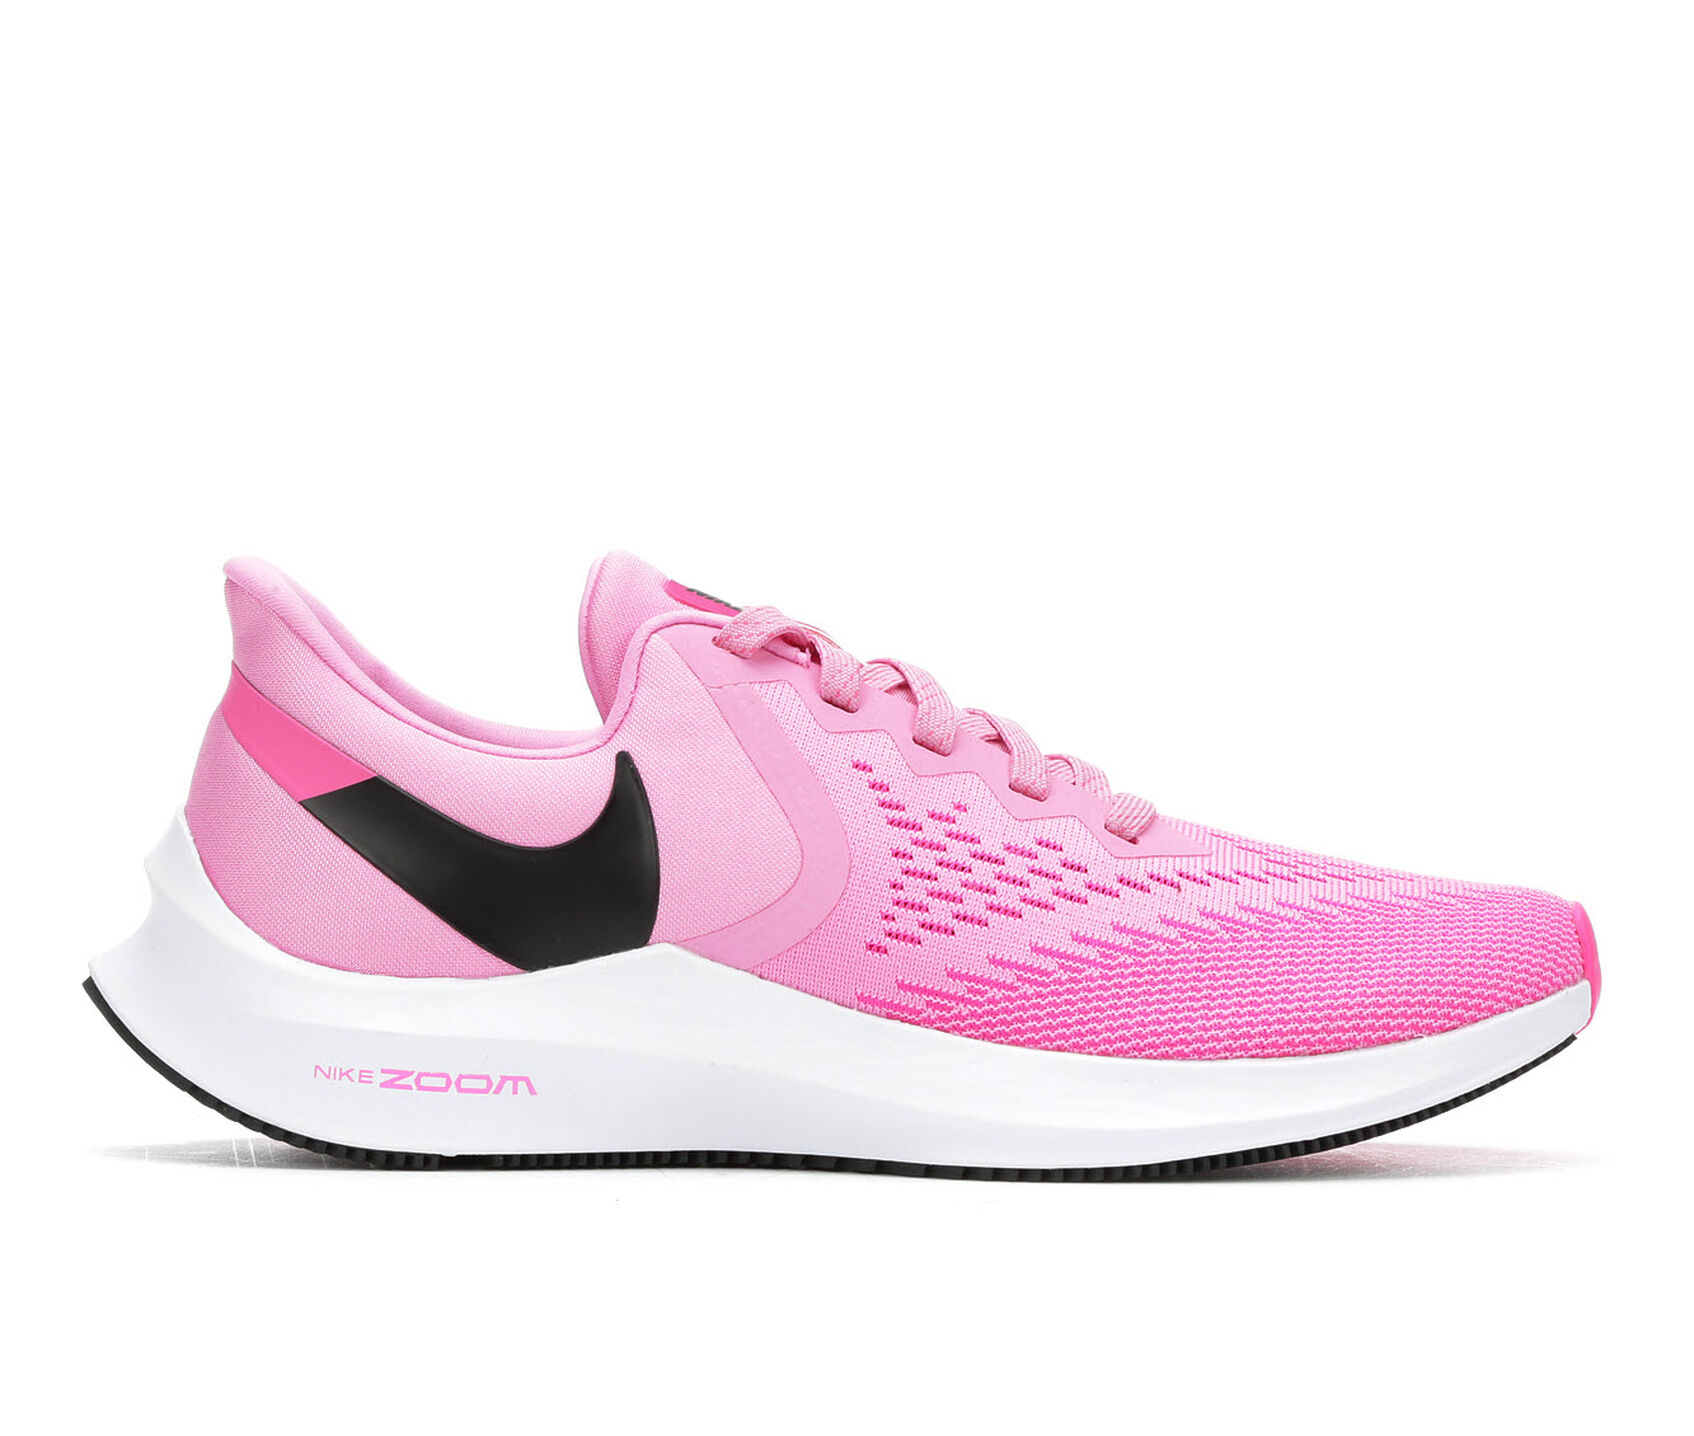 41abe6aab Women's Nike Zoom Winflo 6 Running Shoes | Shoe Carnival